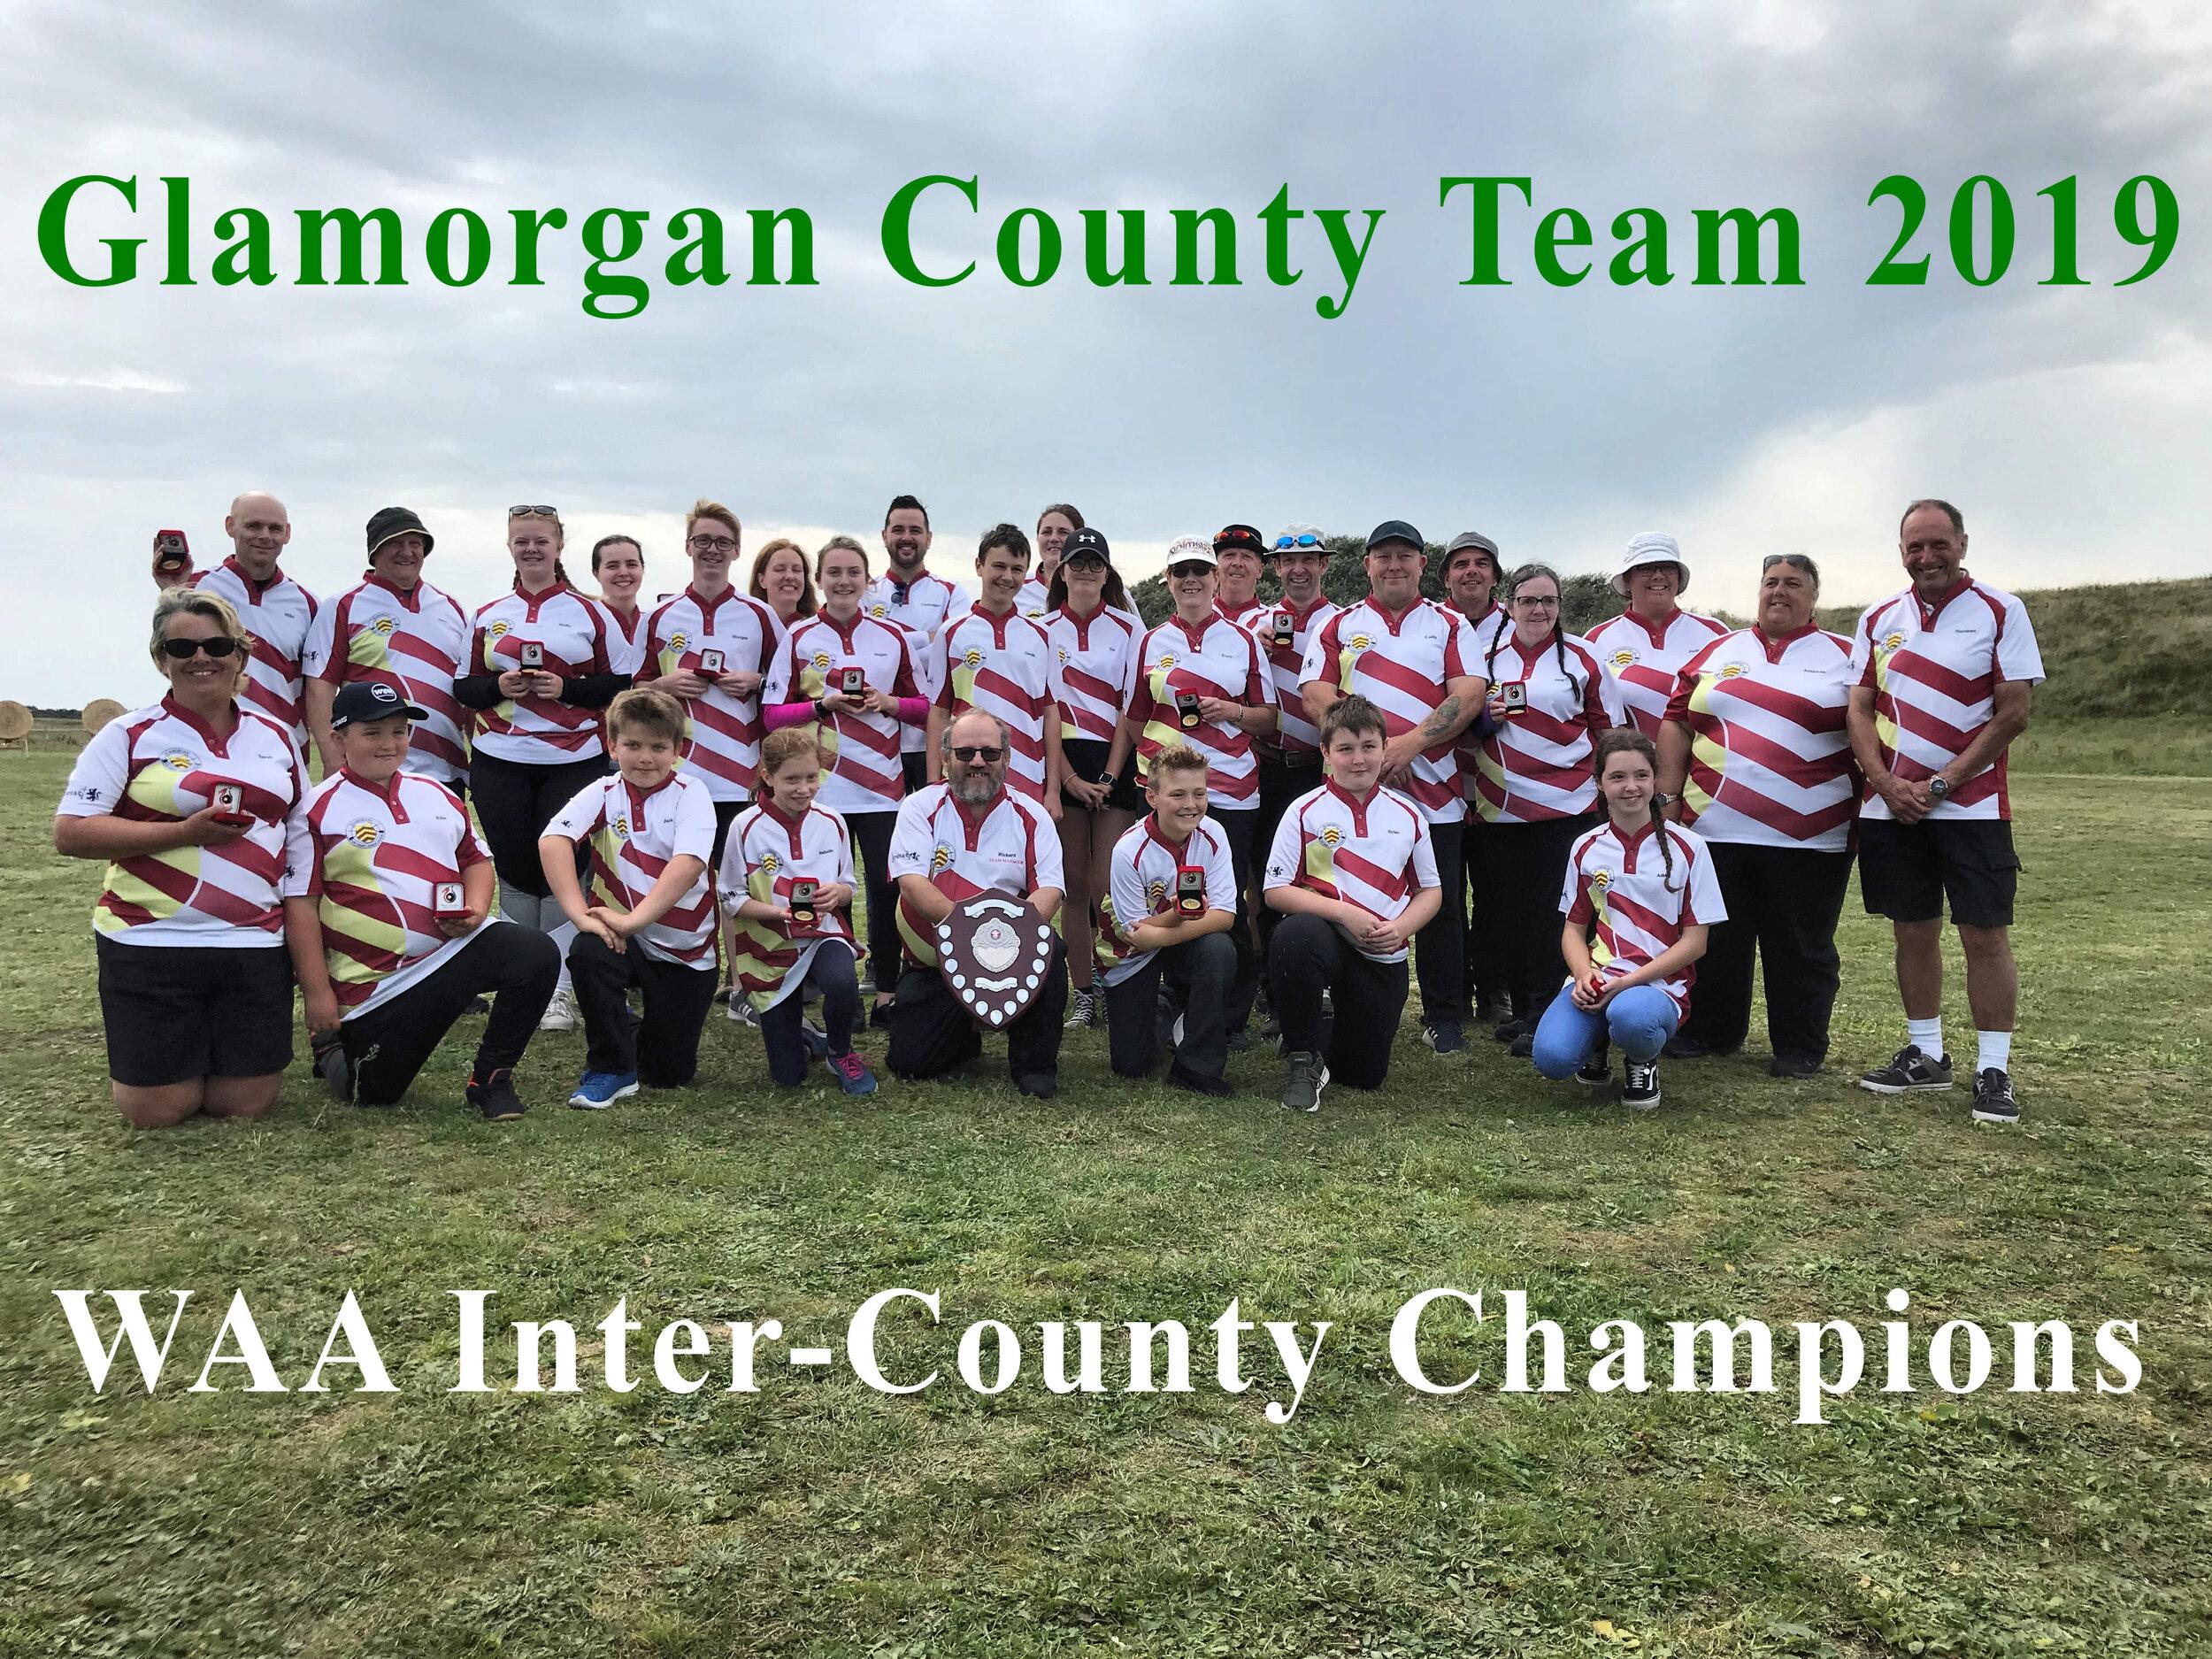 Glamorgan Team 2019.jpg